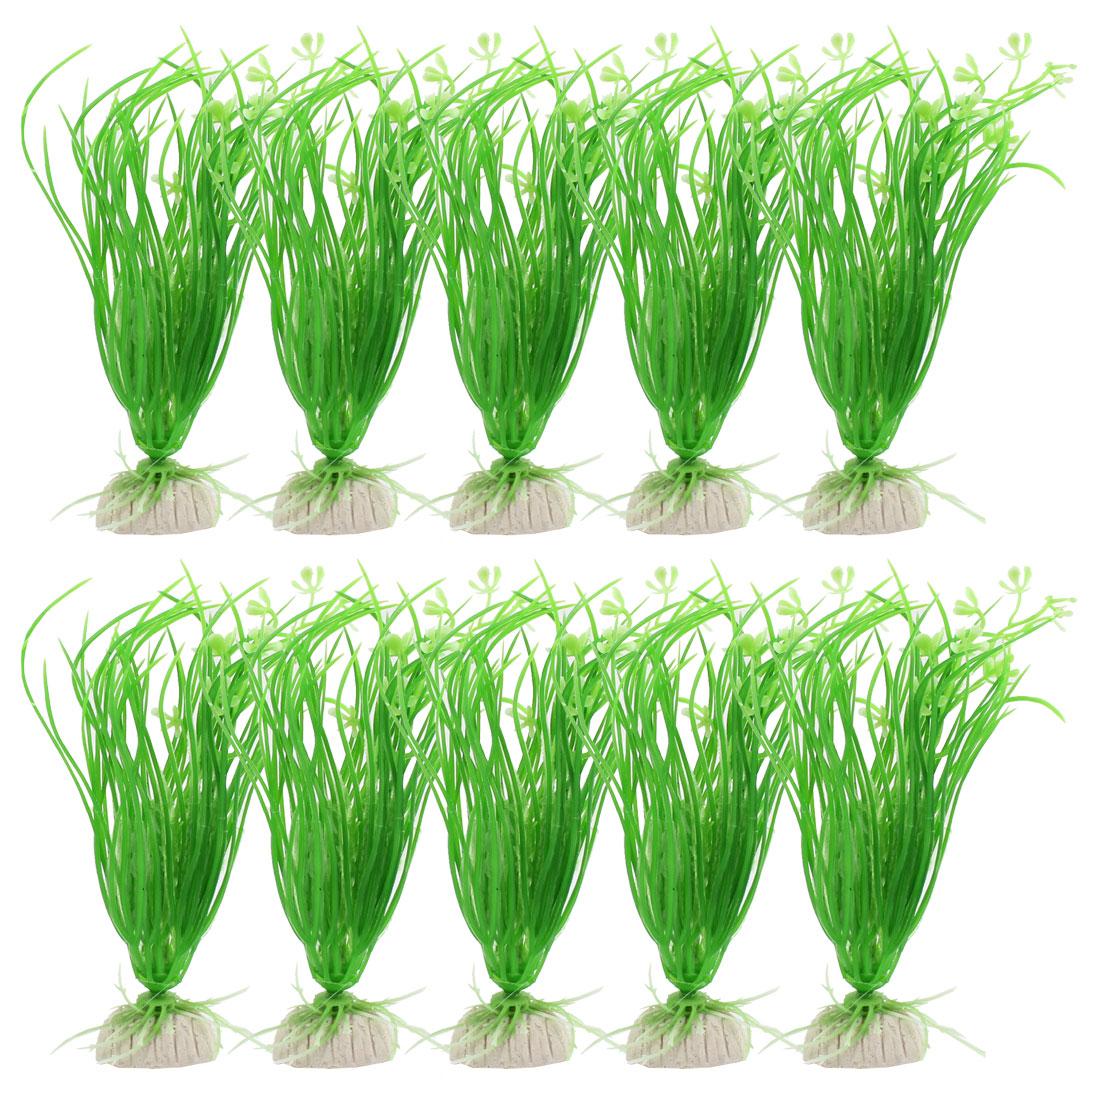 "10 Pcs 5.9"" High Ceramic Base Manmade Plastic Plants Grass Green for Fish Tank"